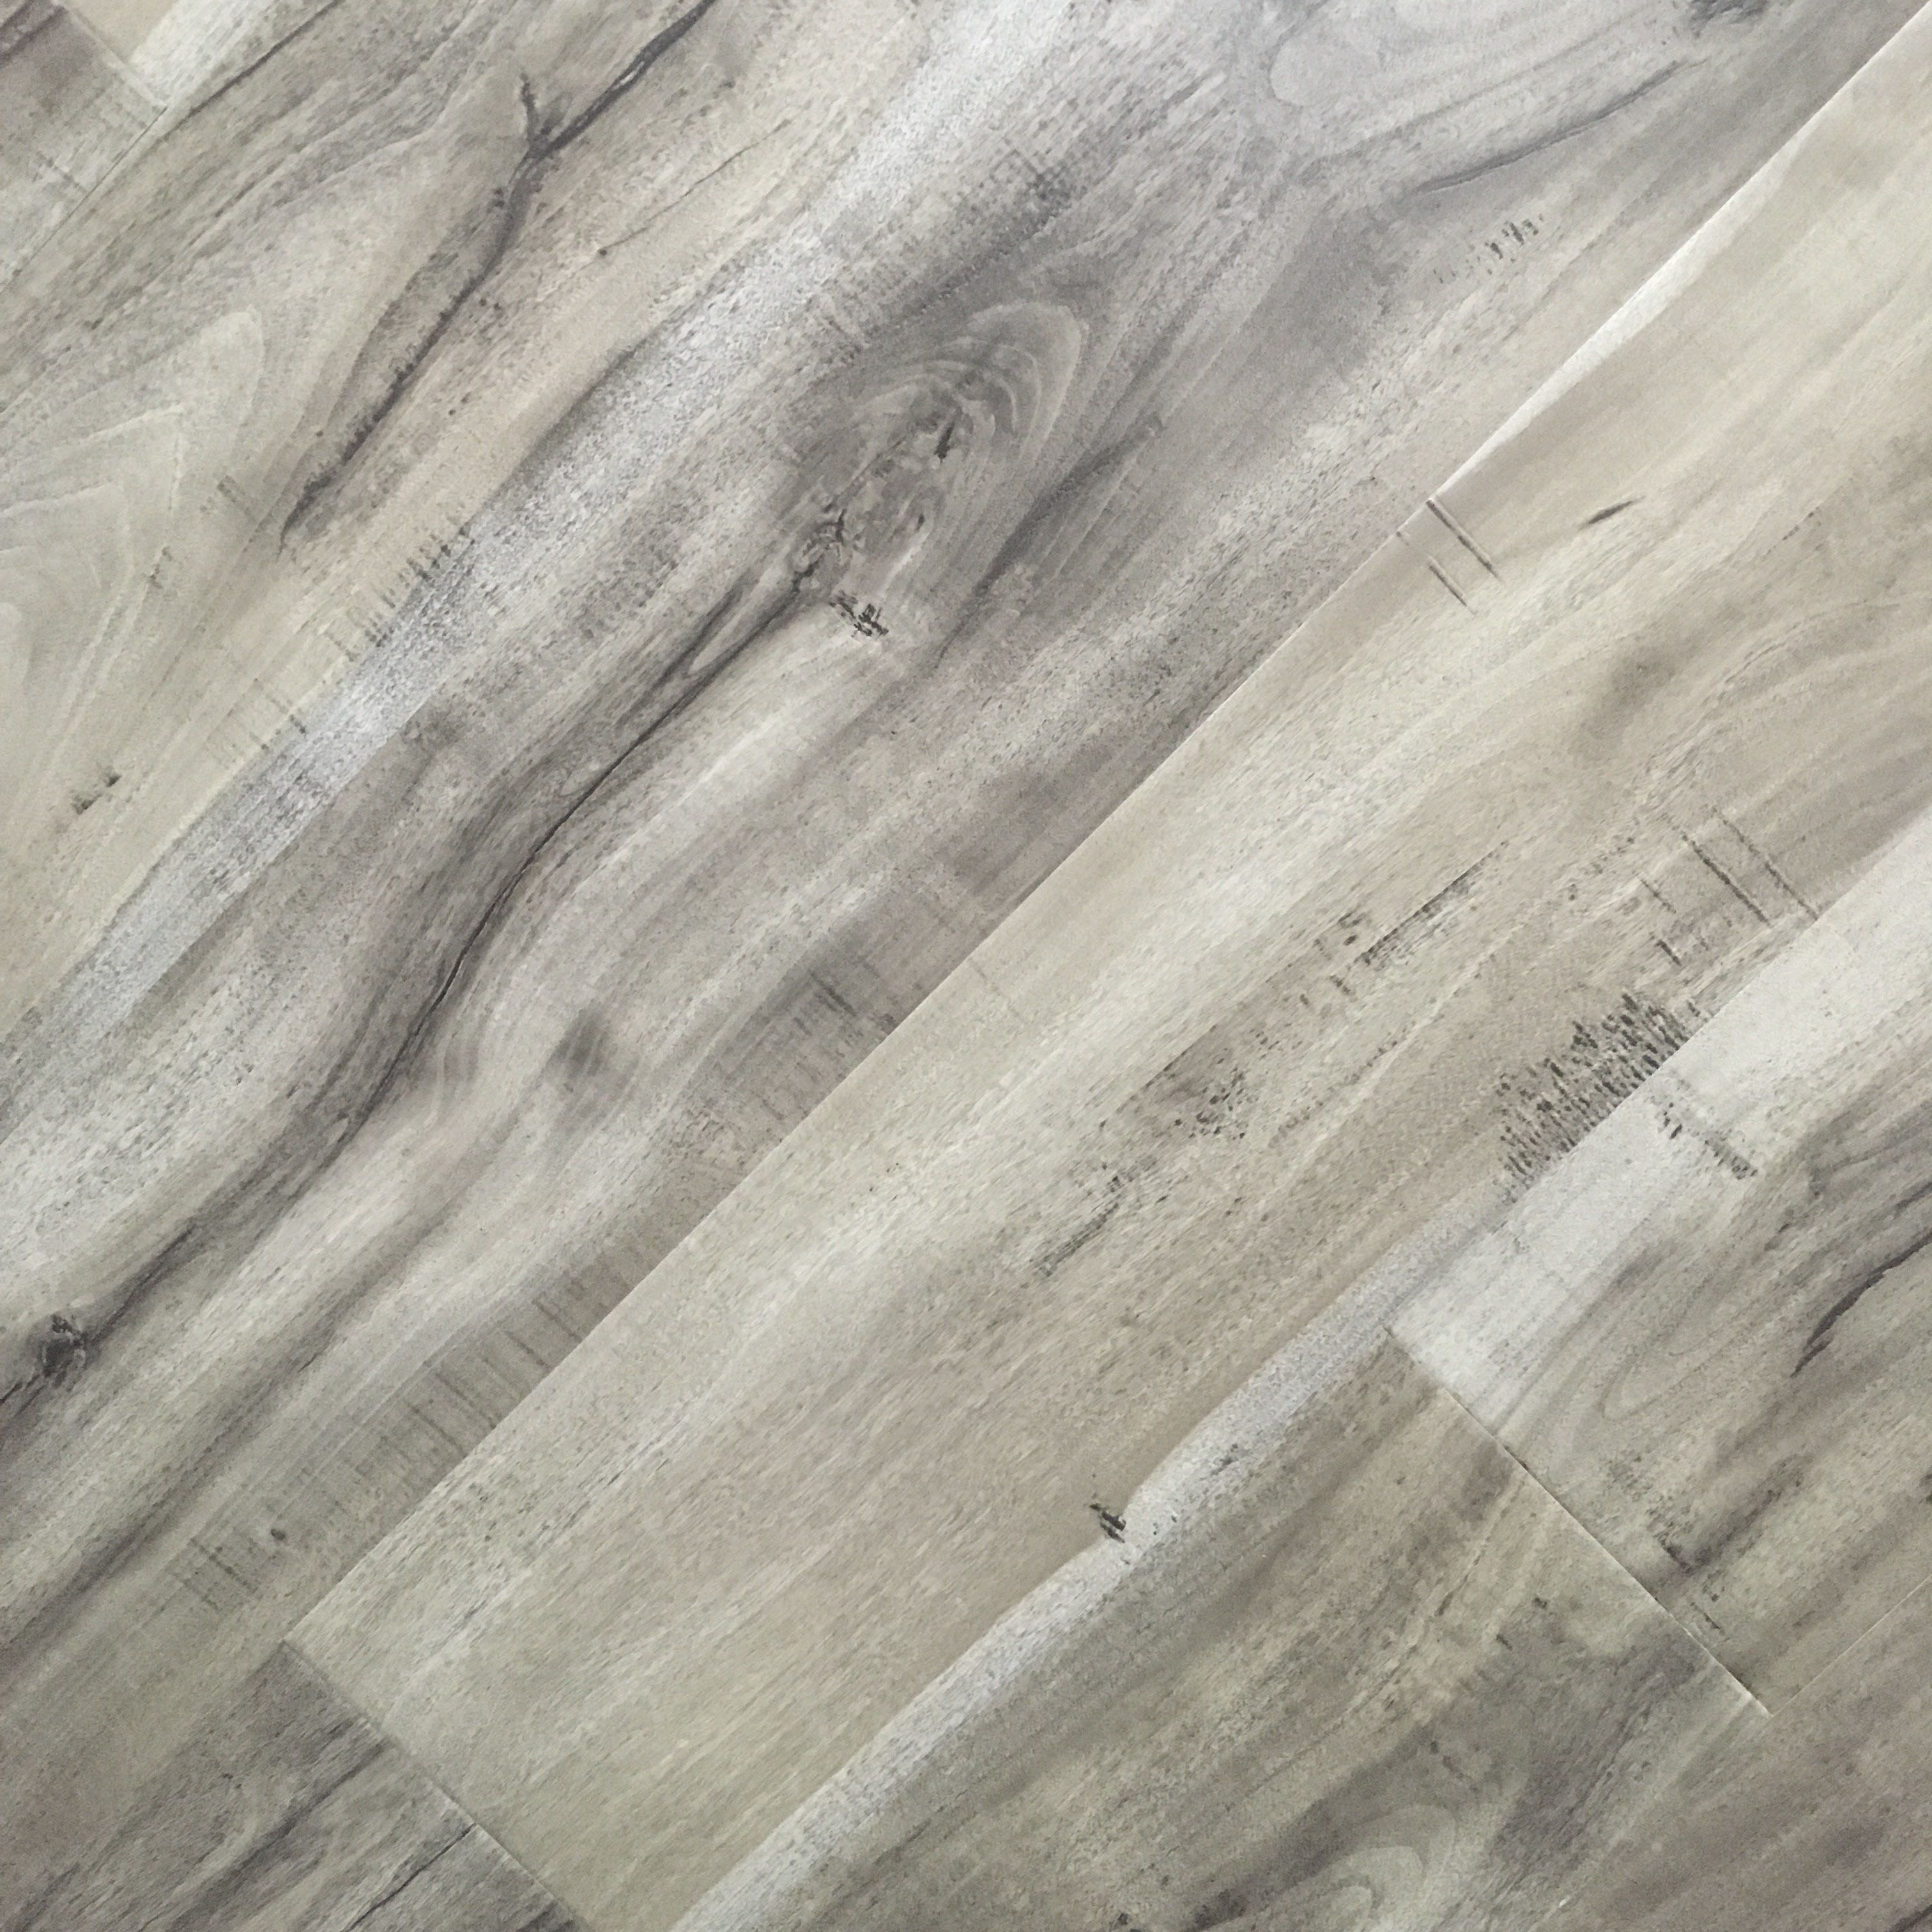 Cool Wooden Laminate Flooring Bangalore Exclusive On Interioropedia Home Decor Flooring Laminate Flooring Urban Loft